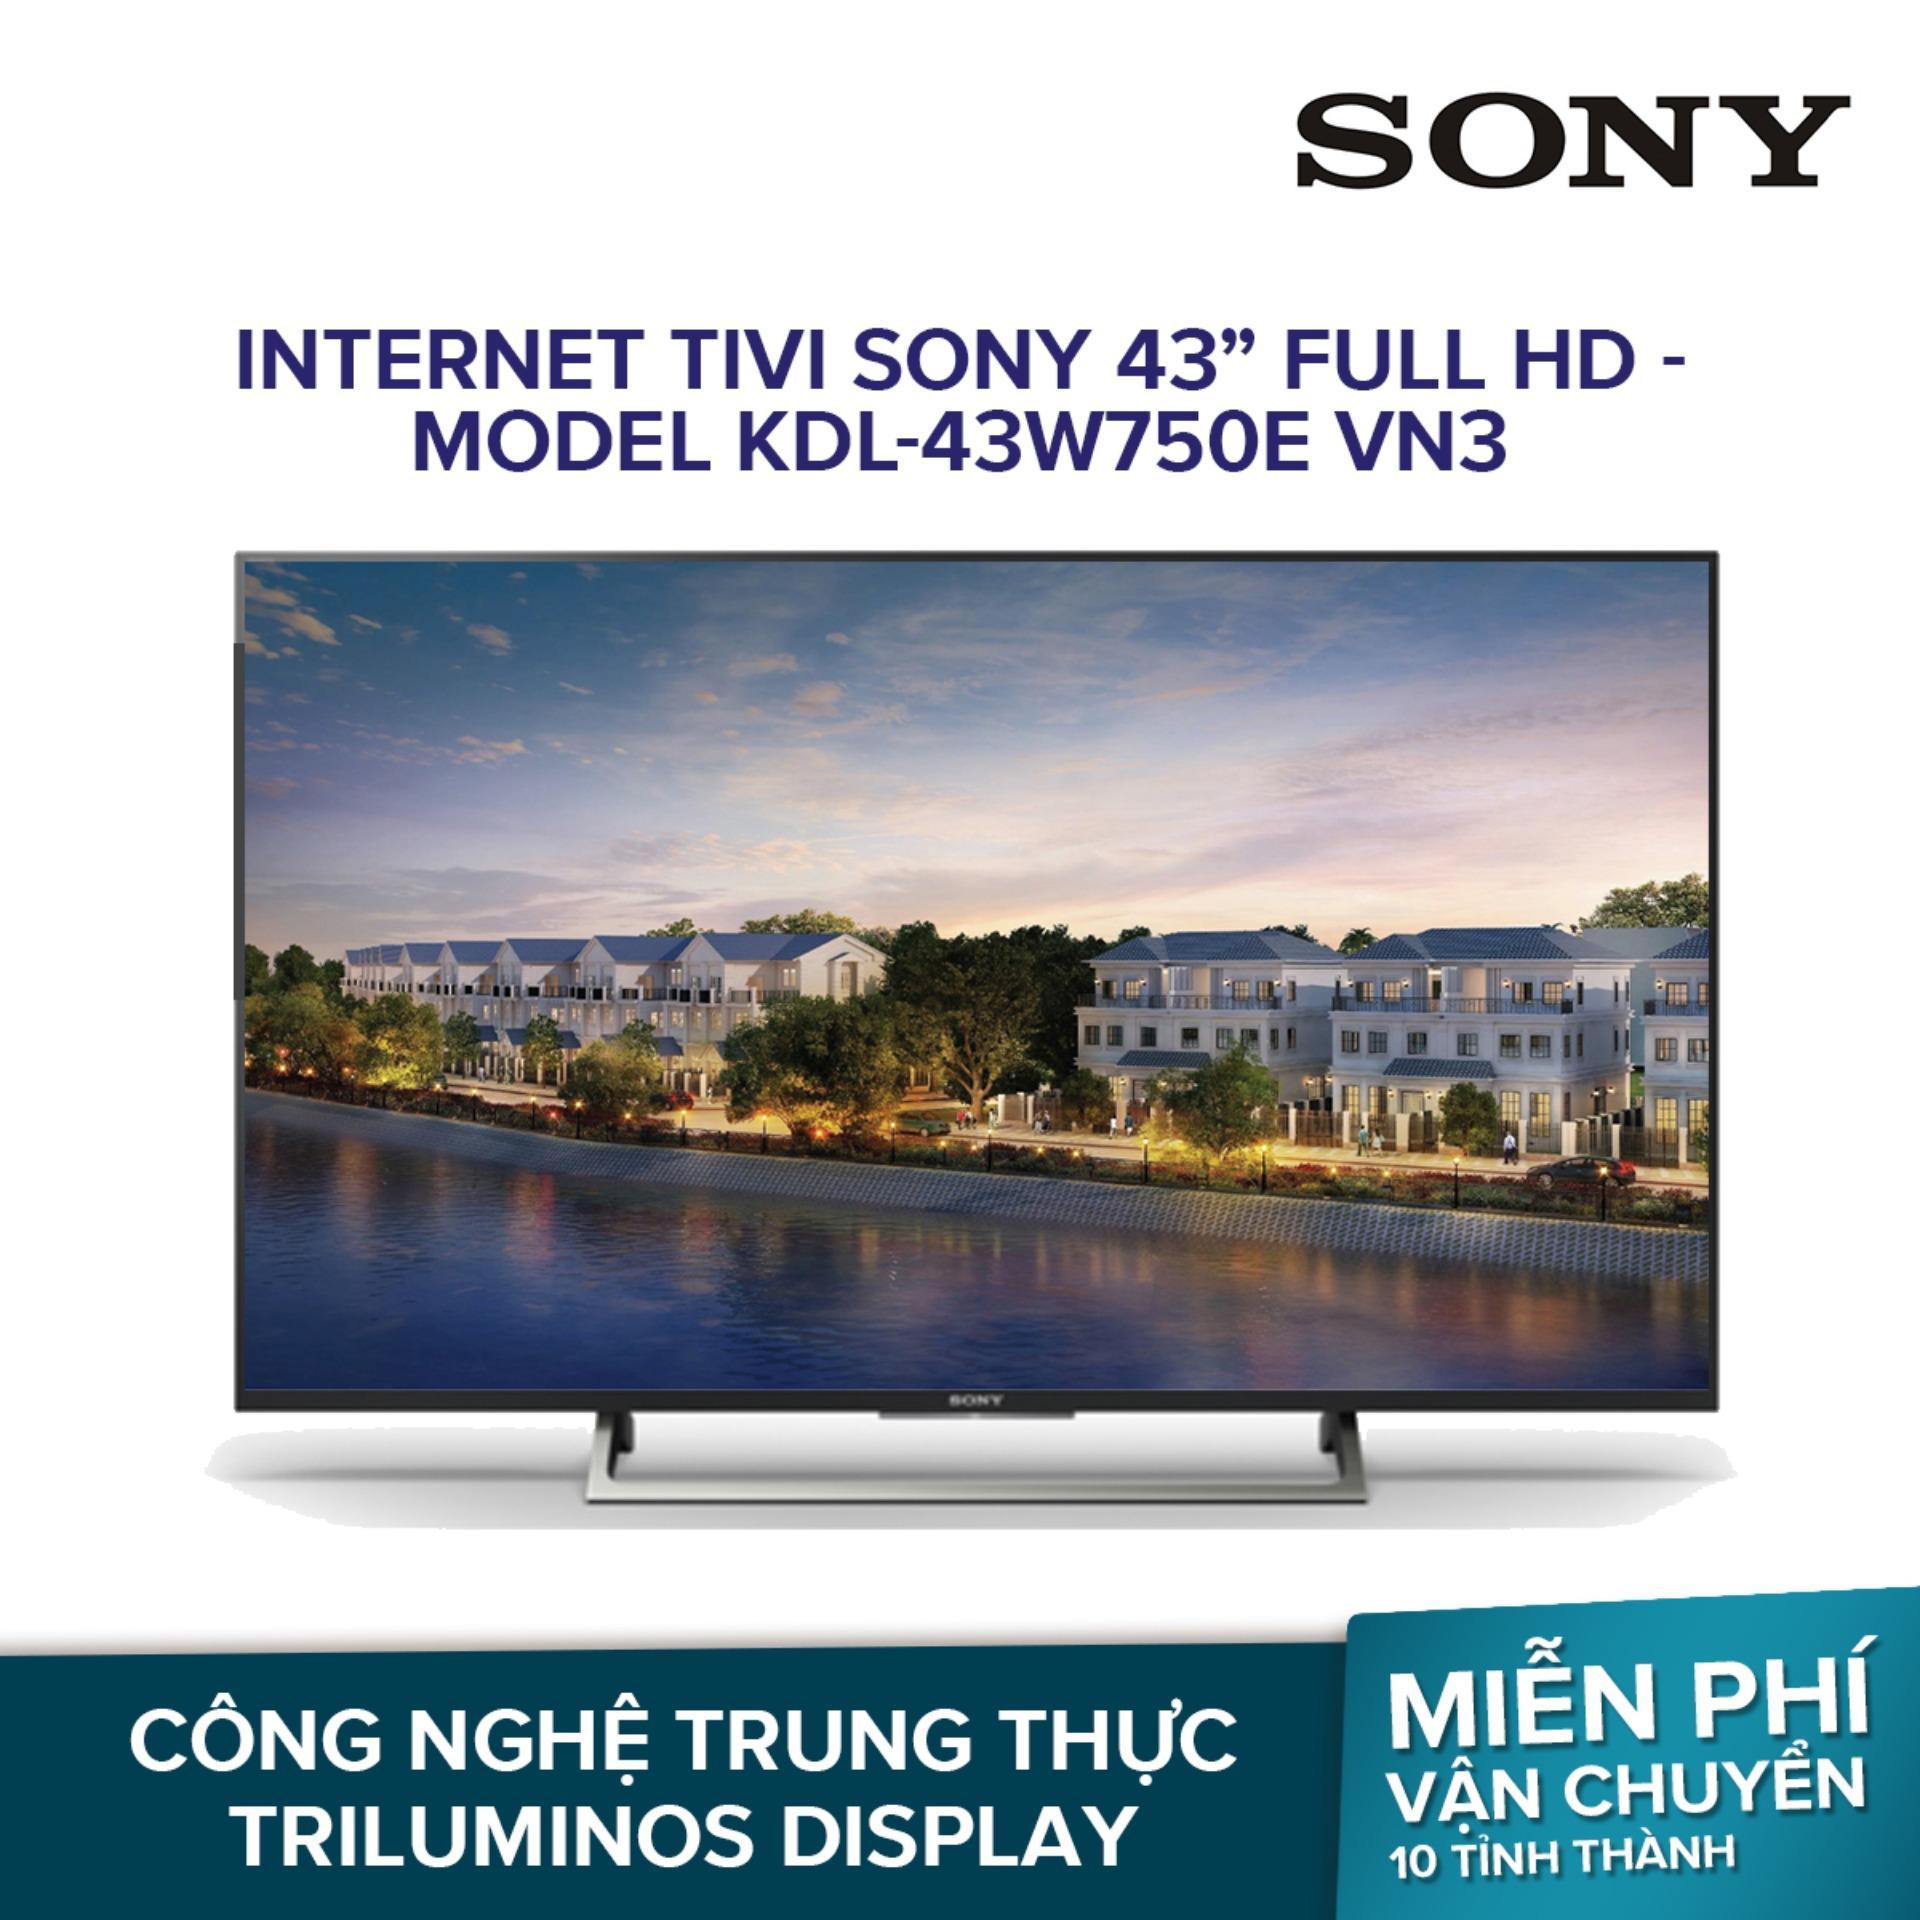 Internet Tivi Sony 43 inch Full HD - Model KDL-43W750E VN3